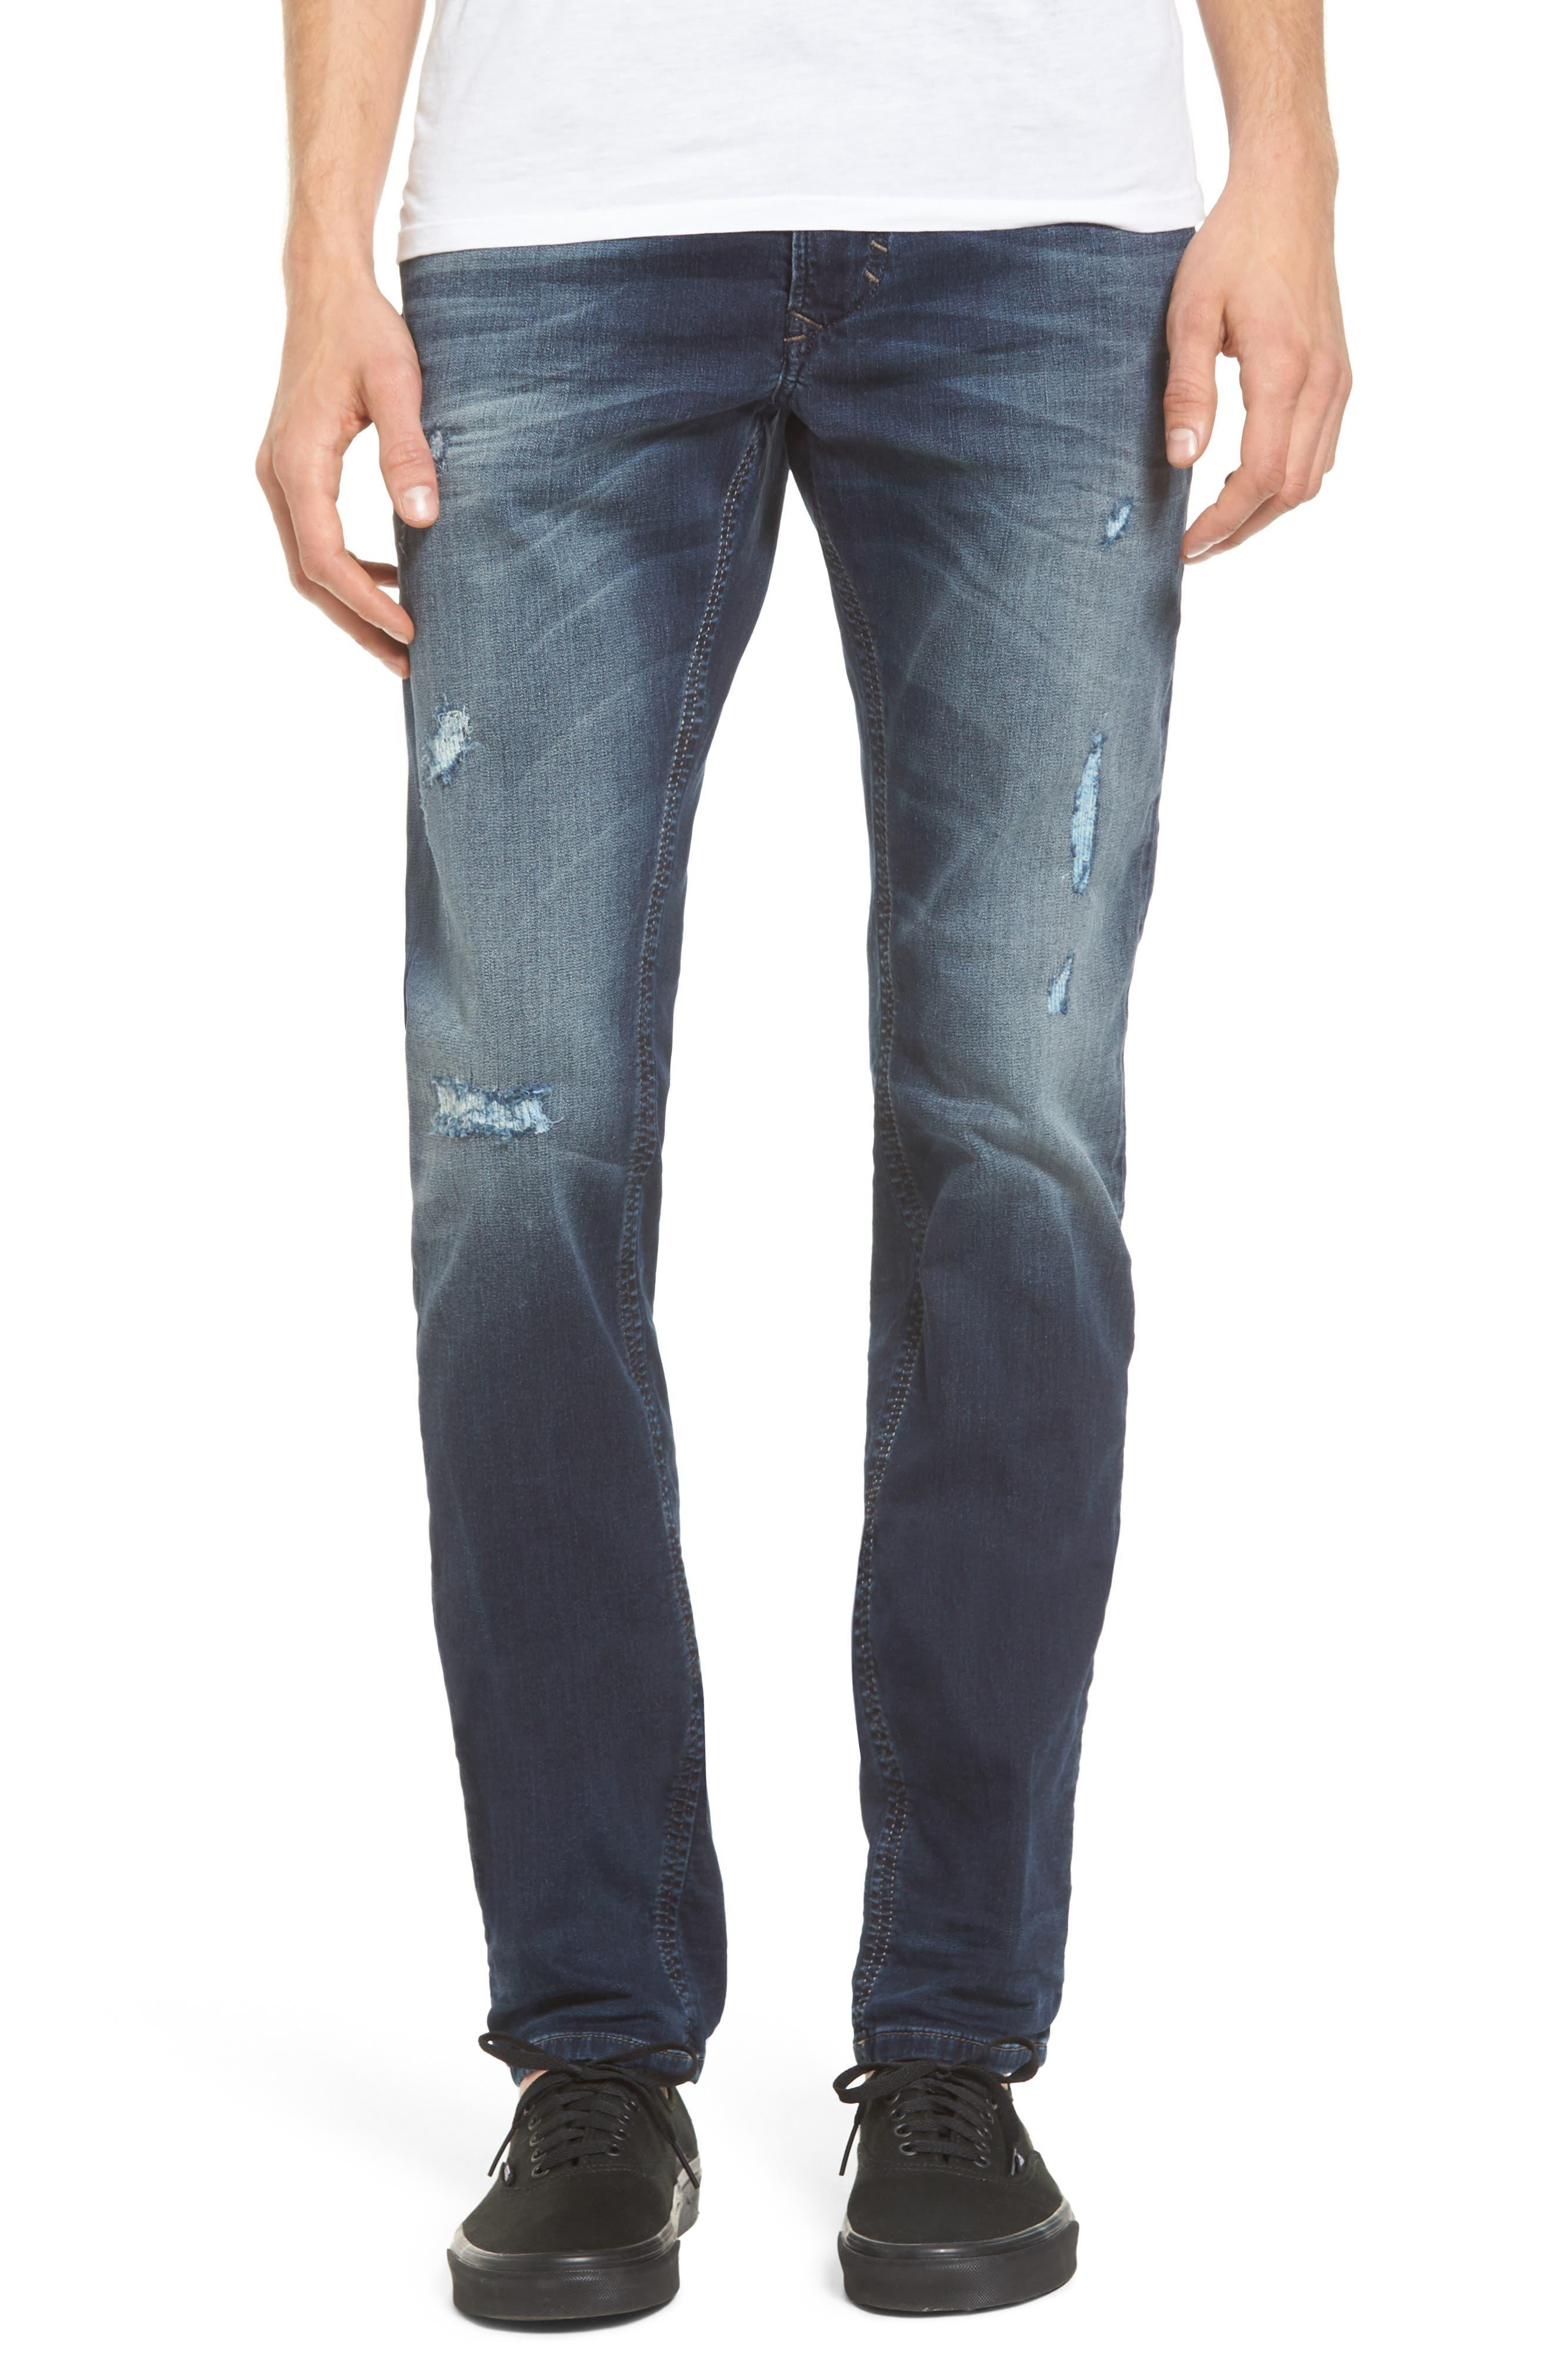 Thavar Skinny Fit Jeans,                         Main,                         color, Denim